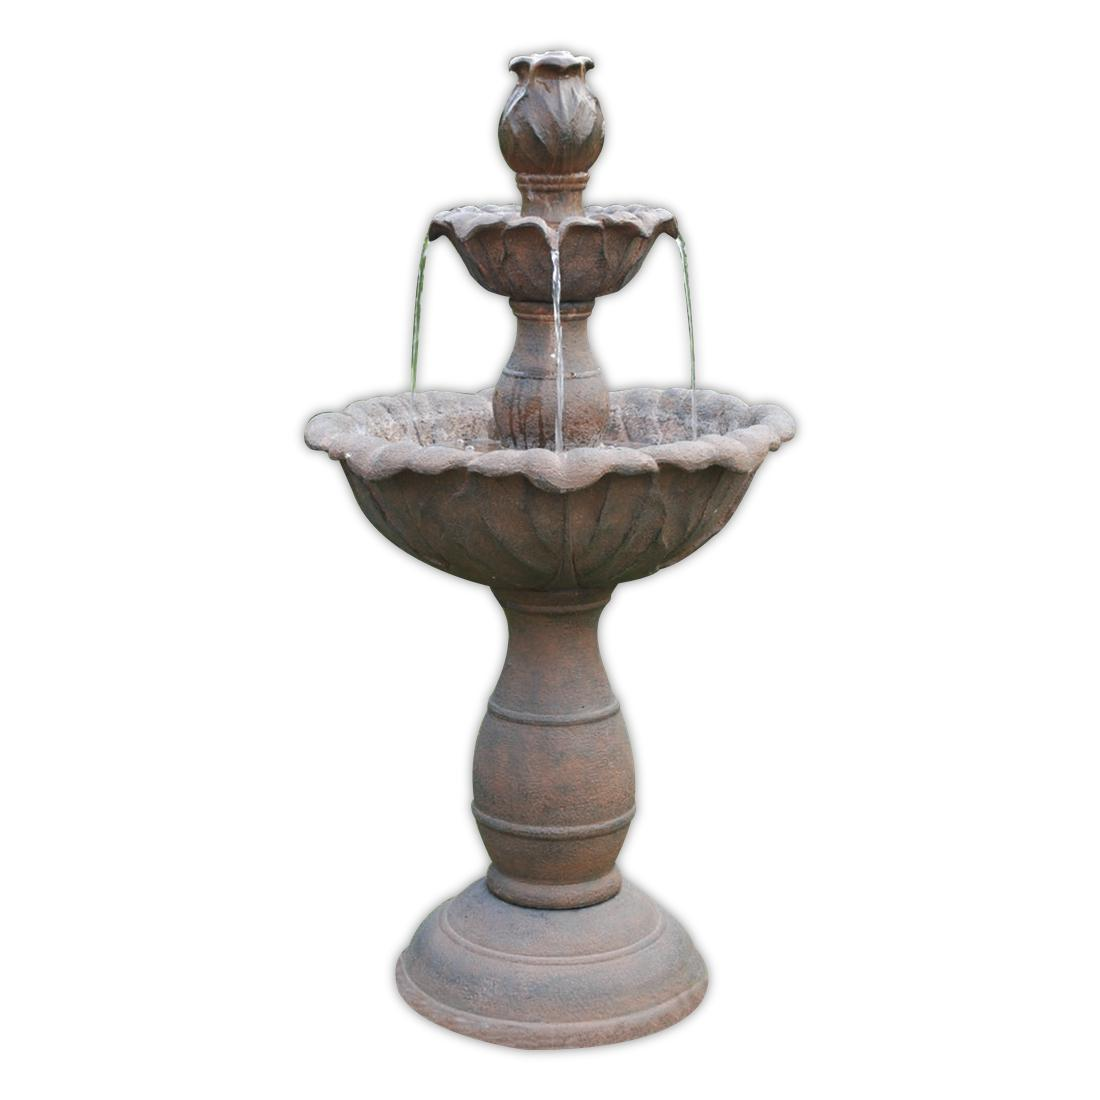 3 Tier Rust Fountain Garden Water Features Depot